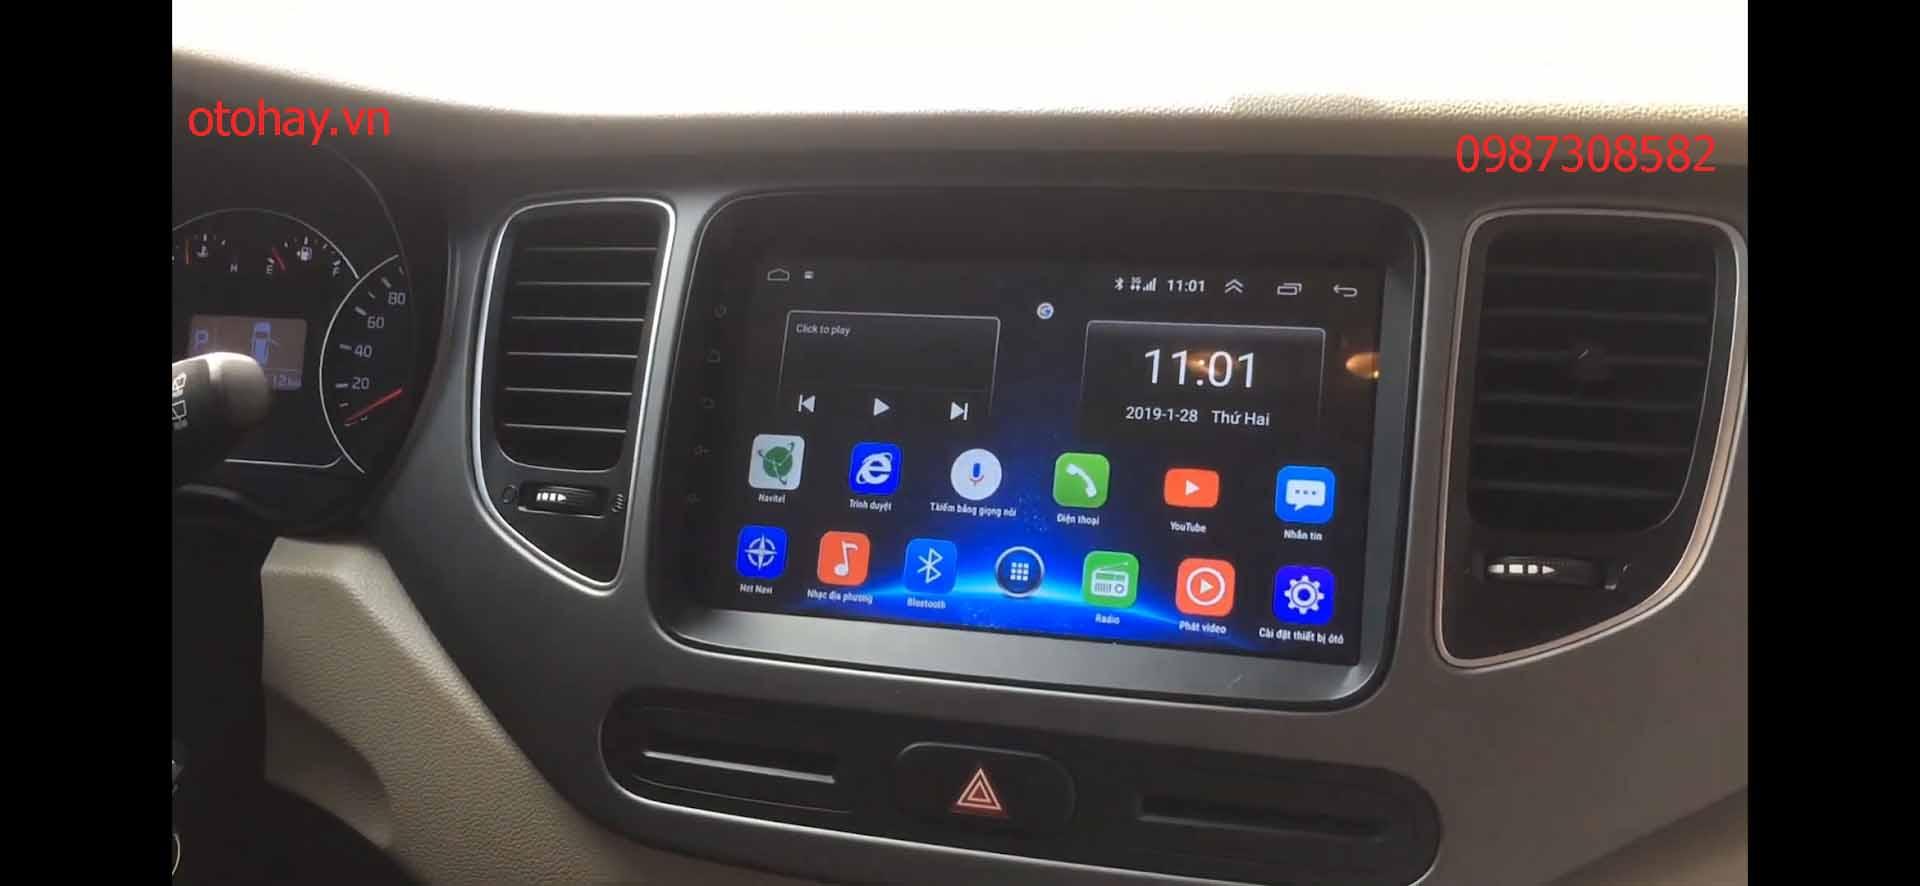 Lắp đầu dvd android 4g cho xe kia rondo